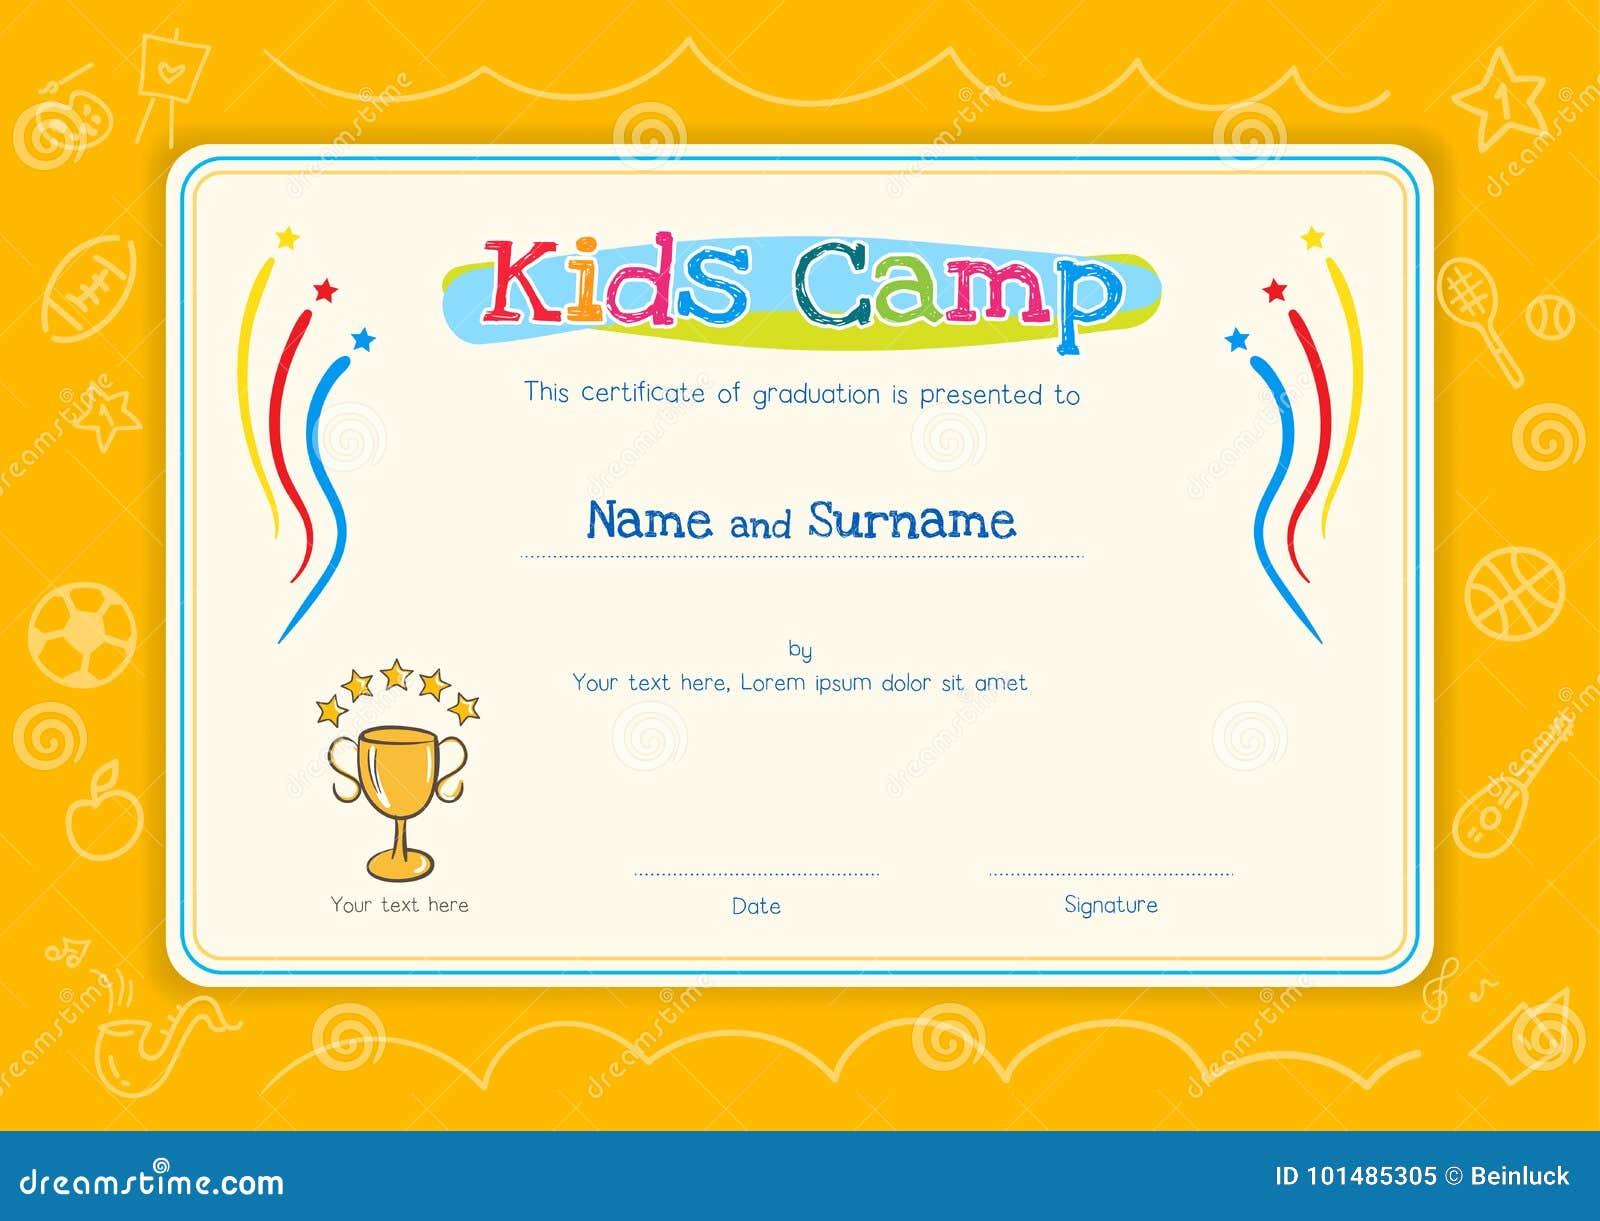 100 preschool graduation certificates templates pre k preschool graduation certificates templates kids diploma certificate template hand loan forms template yadclub Choice Image